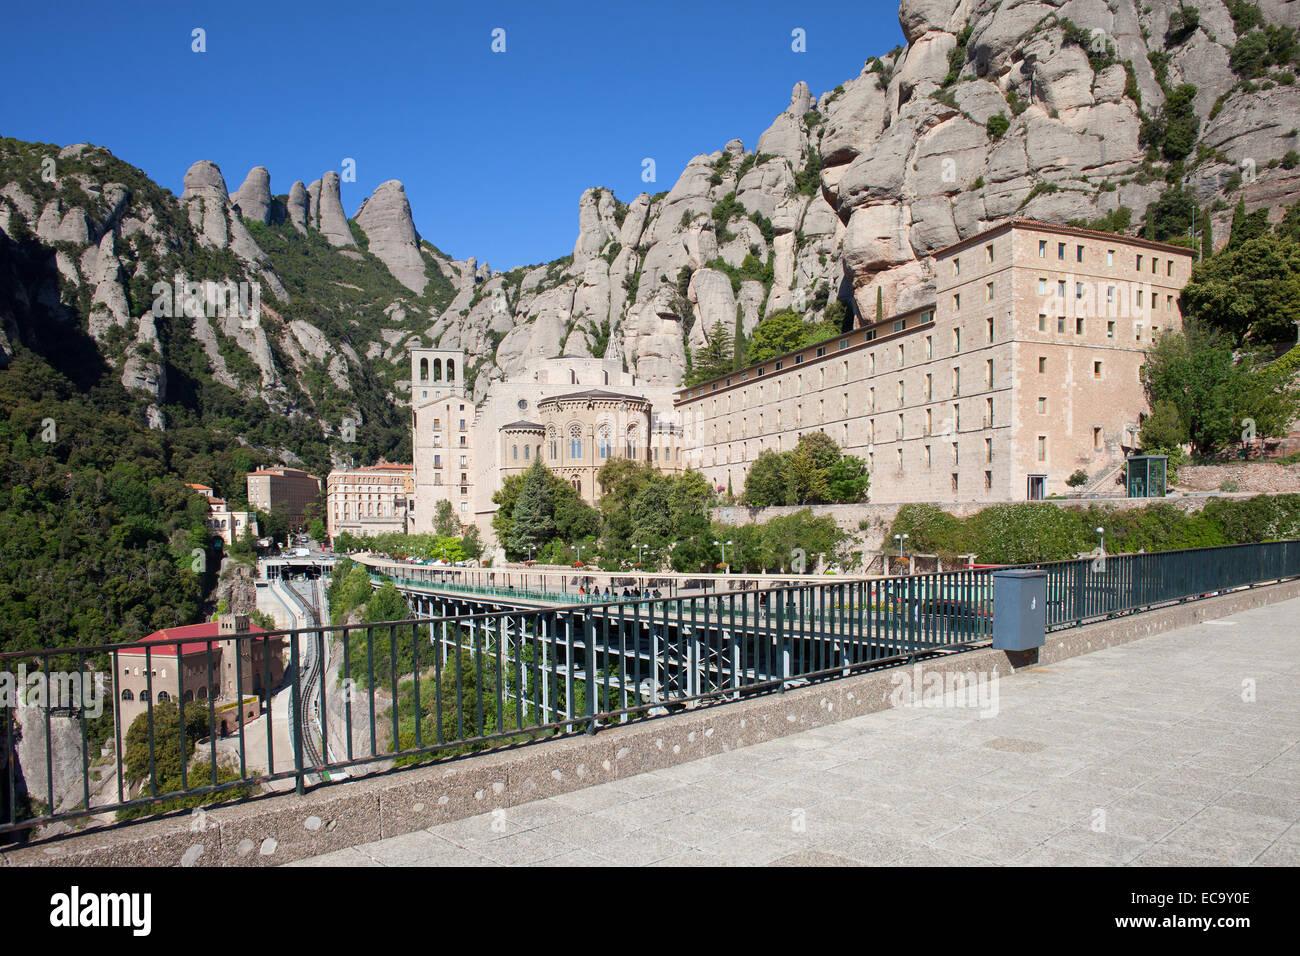 Santa Maria de Montserrat Benedictine monastery high in the mountains, Catalonia, Spain. - Stock Image